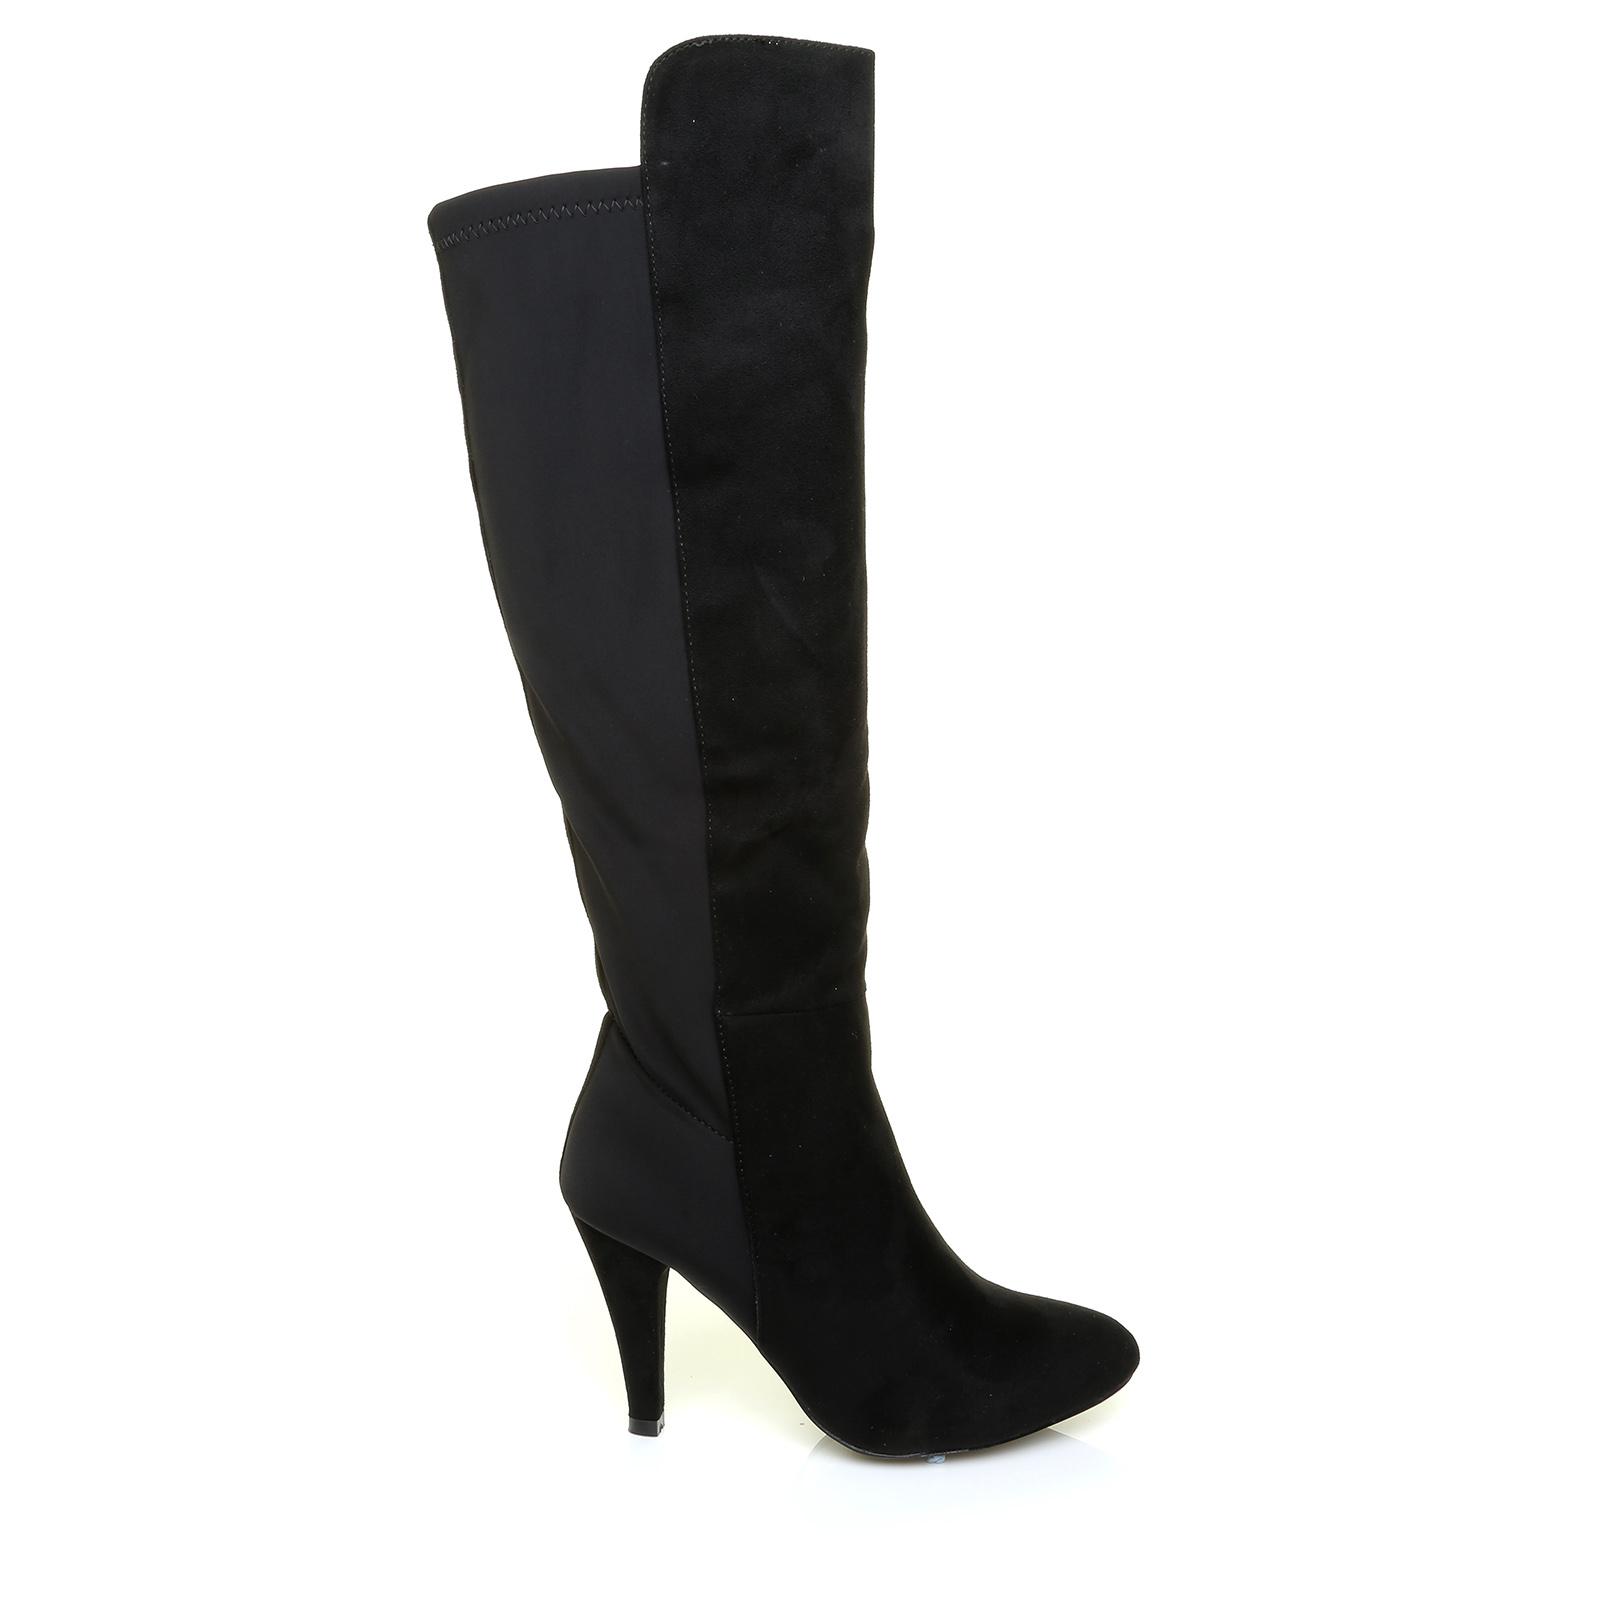 black pu leather elasticated back stretch comfort high